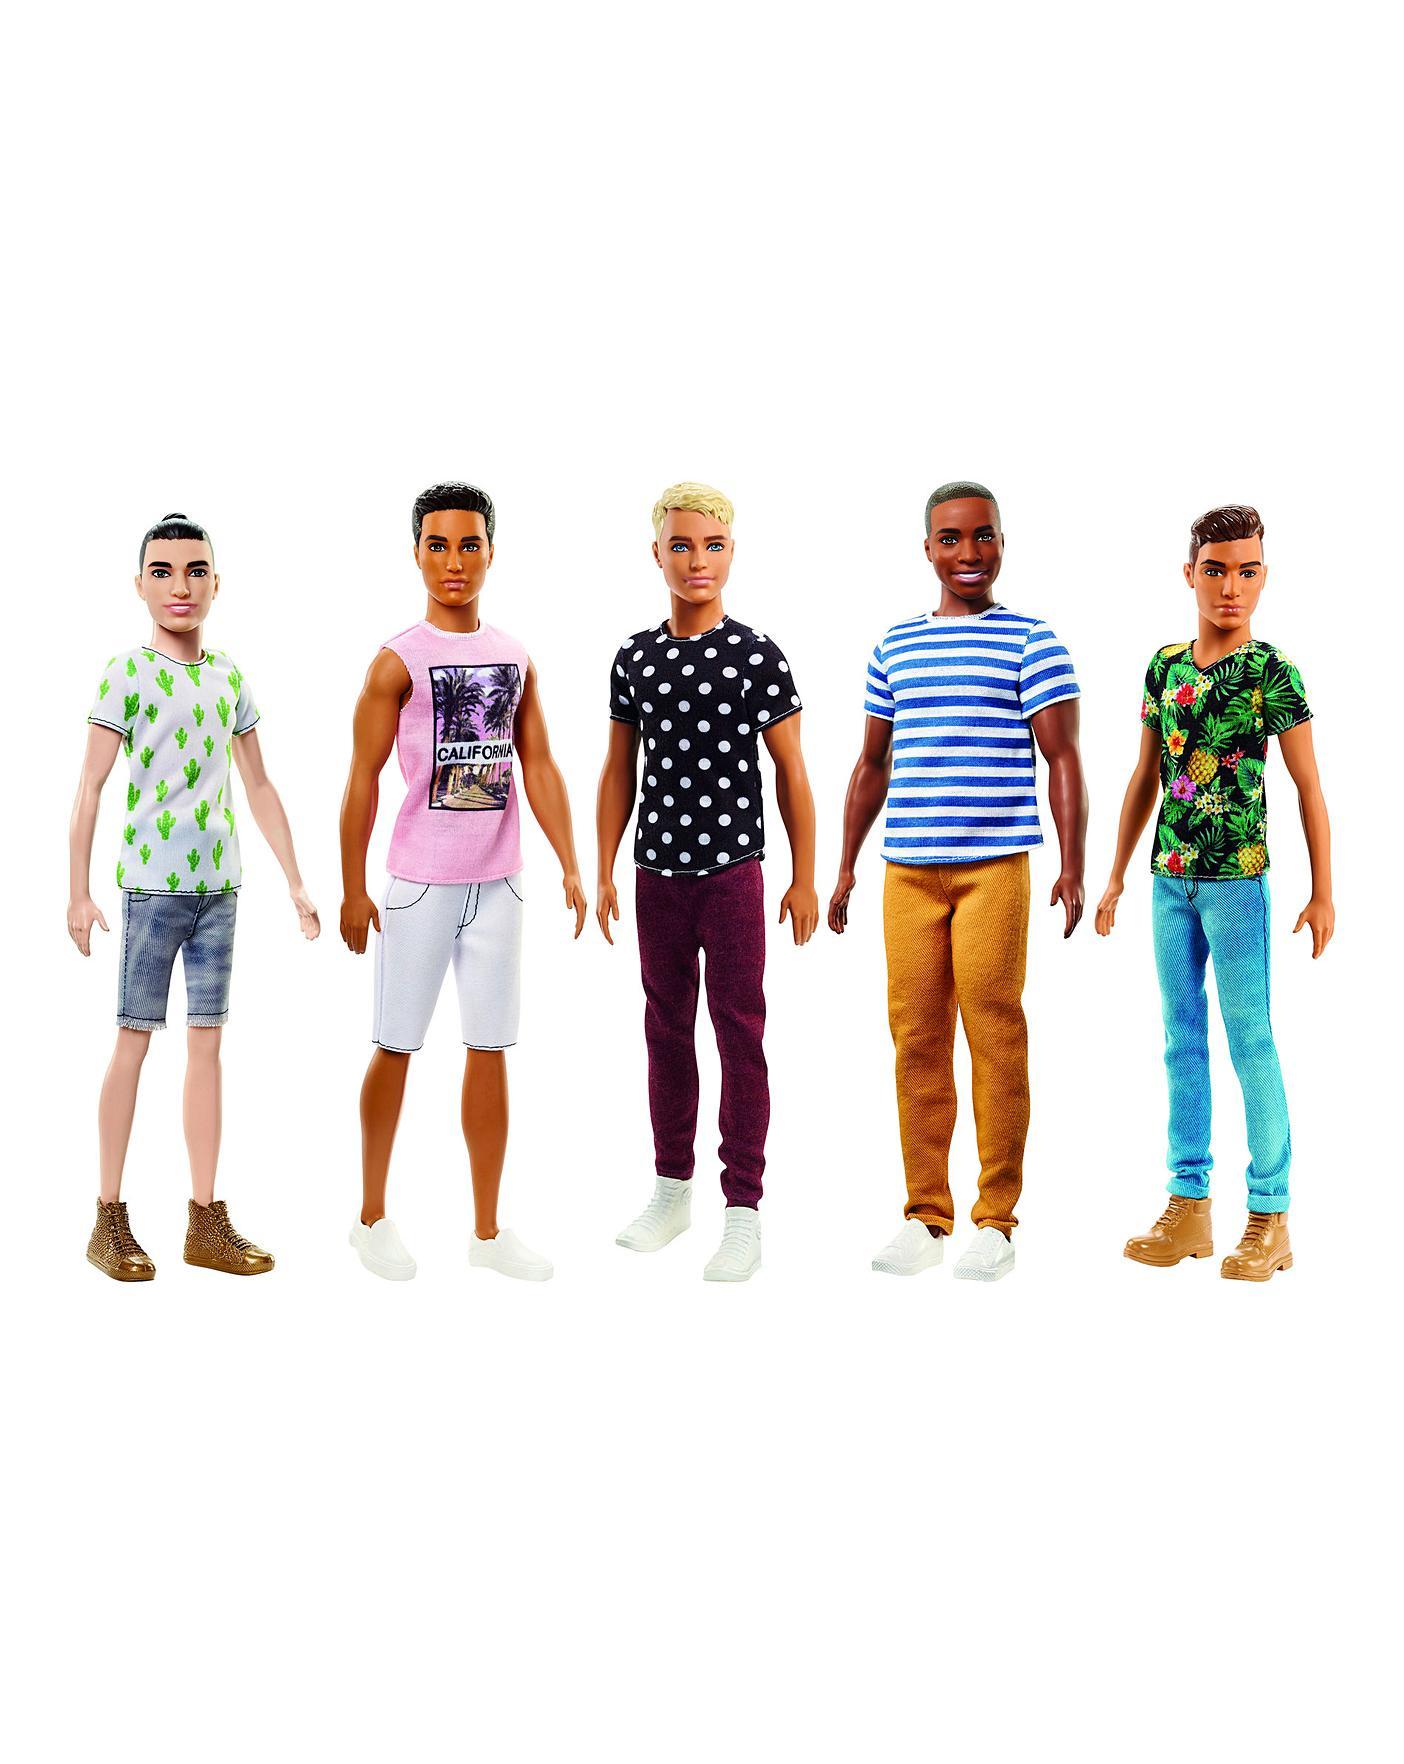 Homemade Doll Clothes-Campfires Print Shirt that fits Ken Doll B4